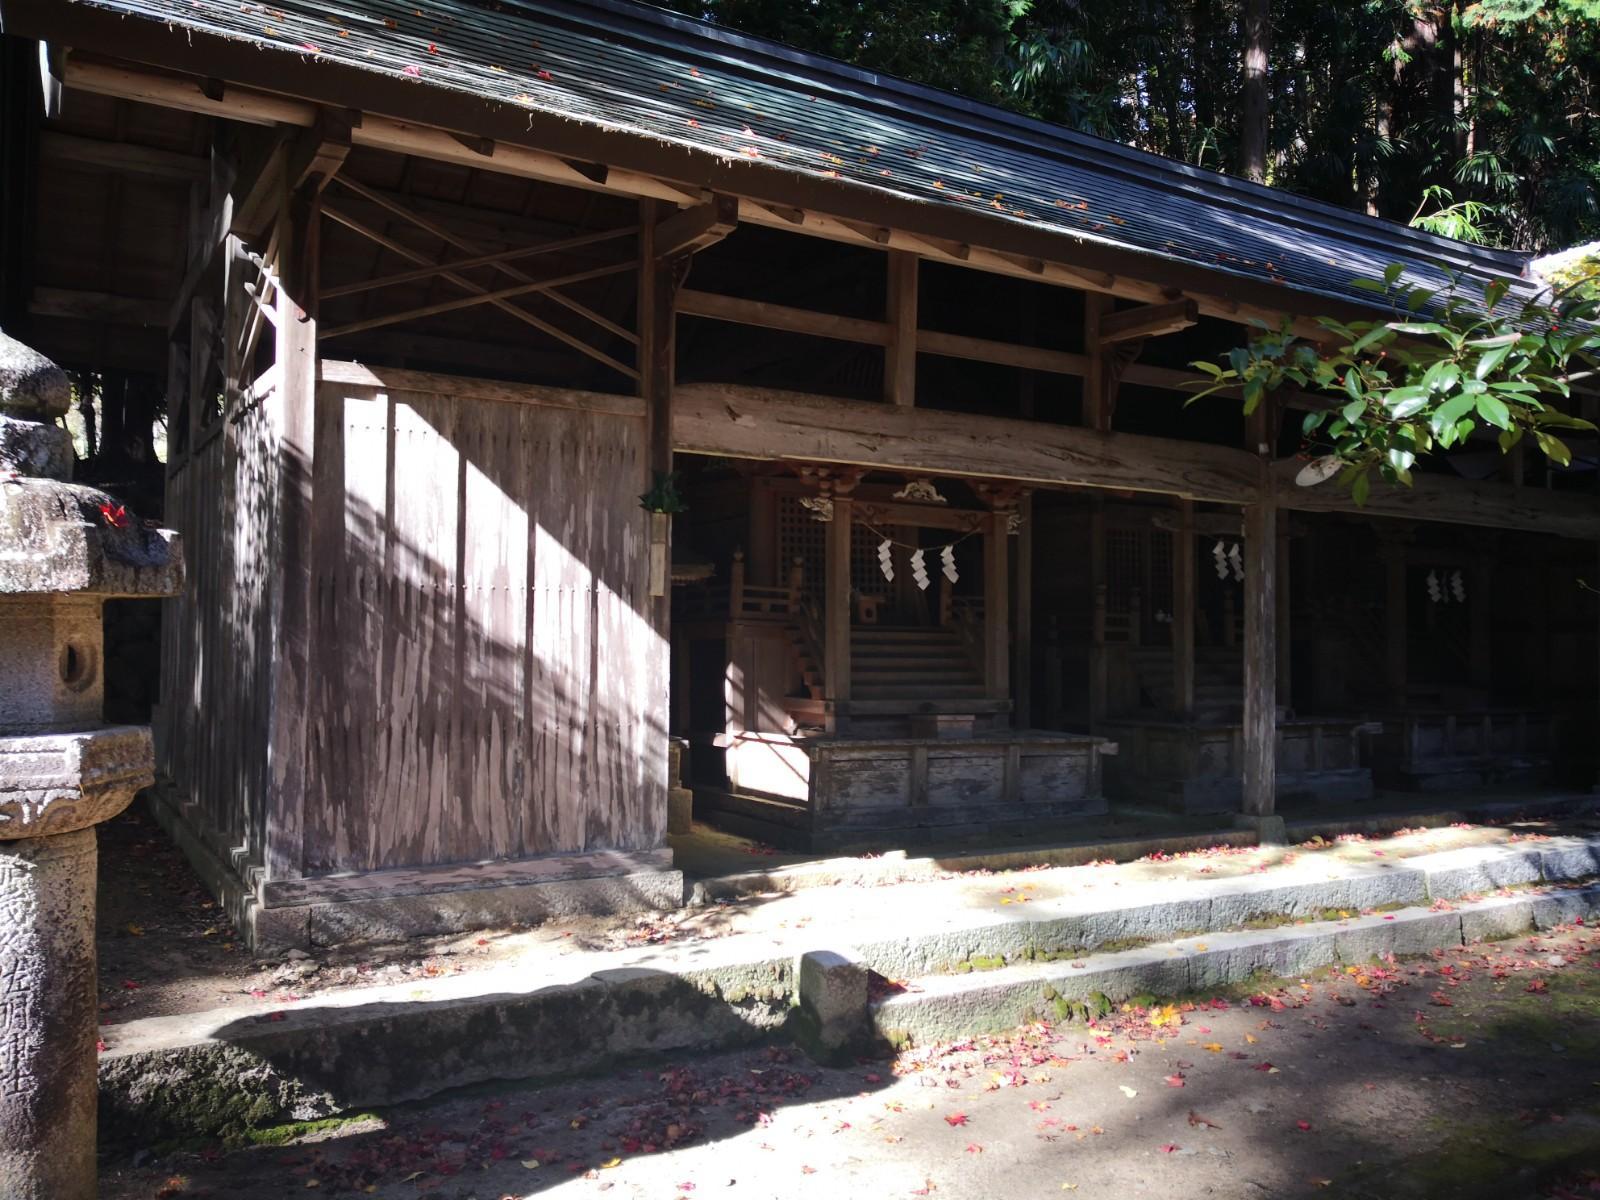 久佐々神社の末社